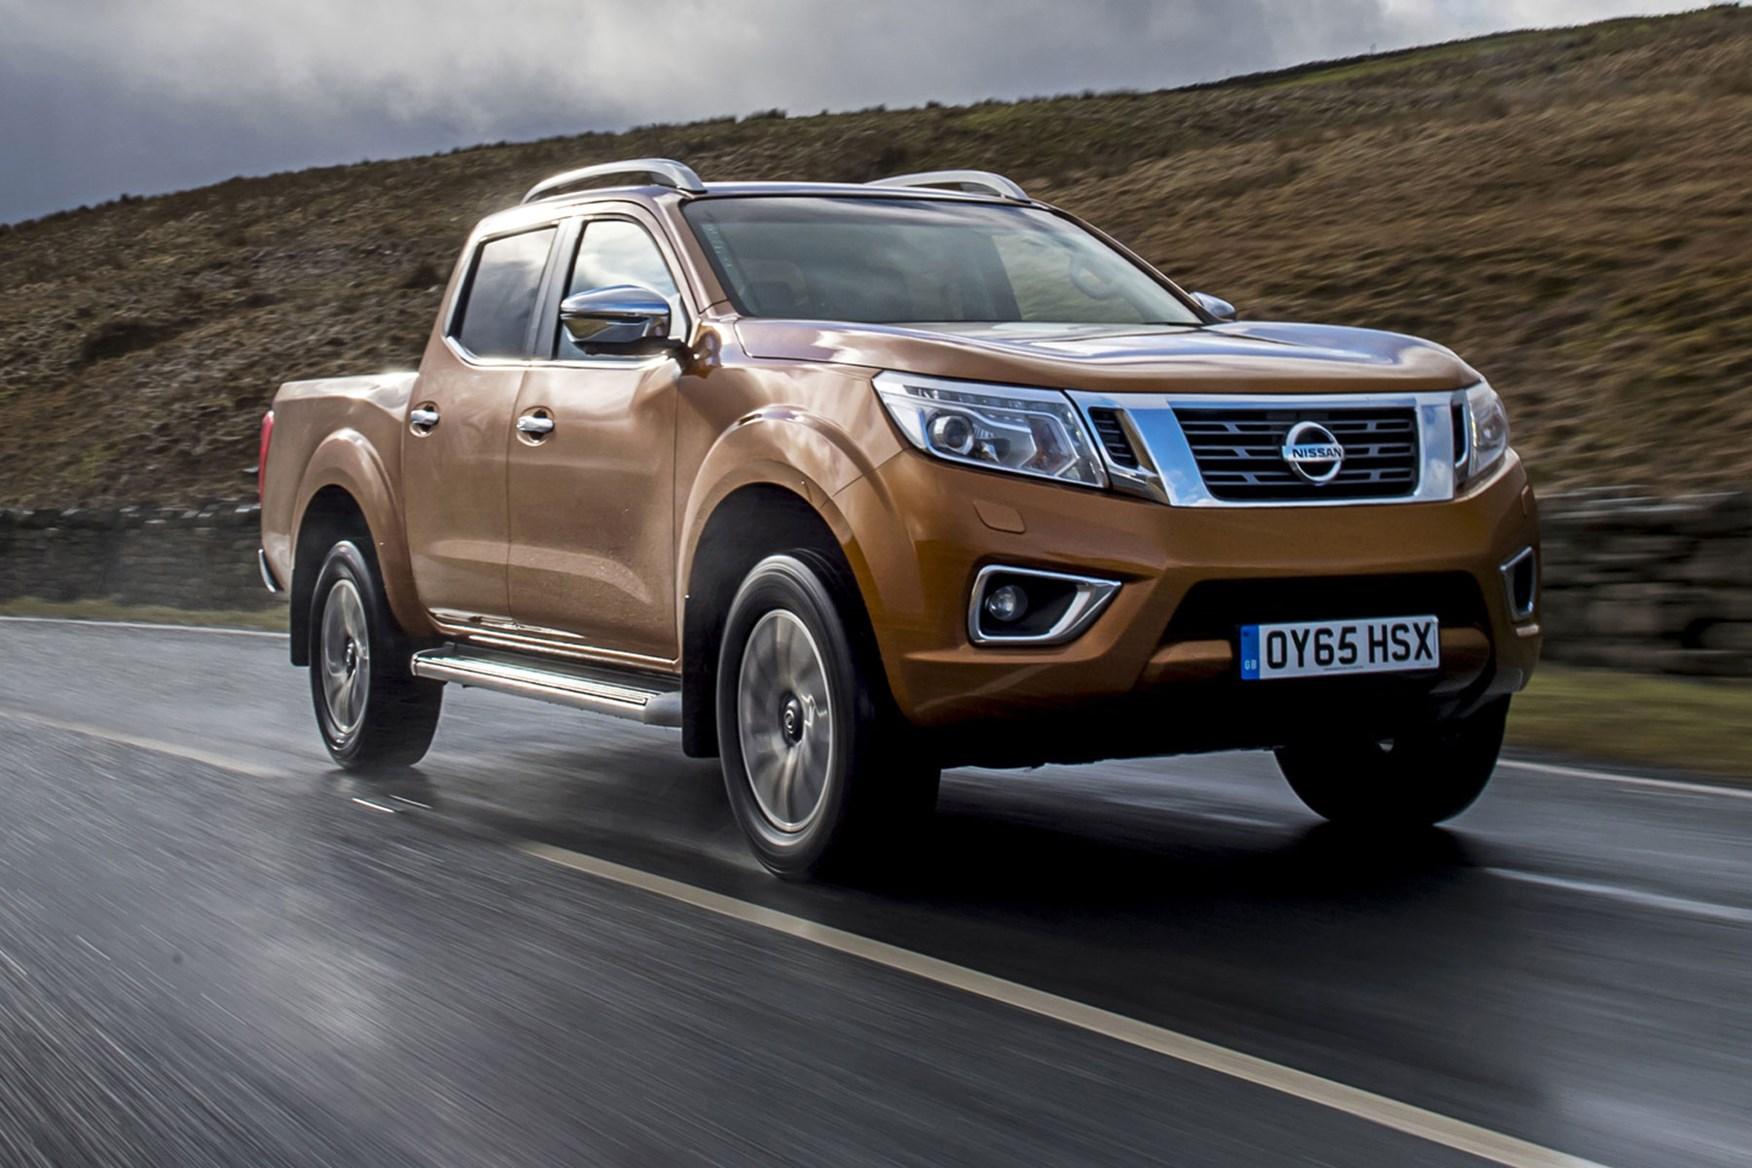 Nissan Navara review - front view, driving, orange